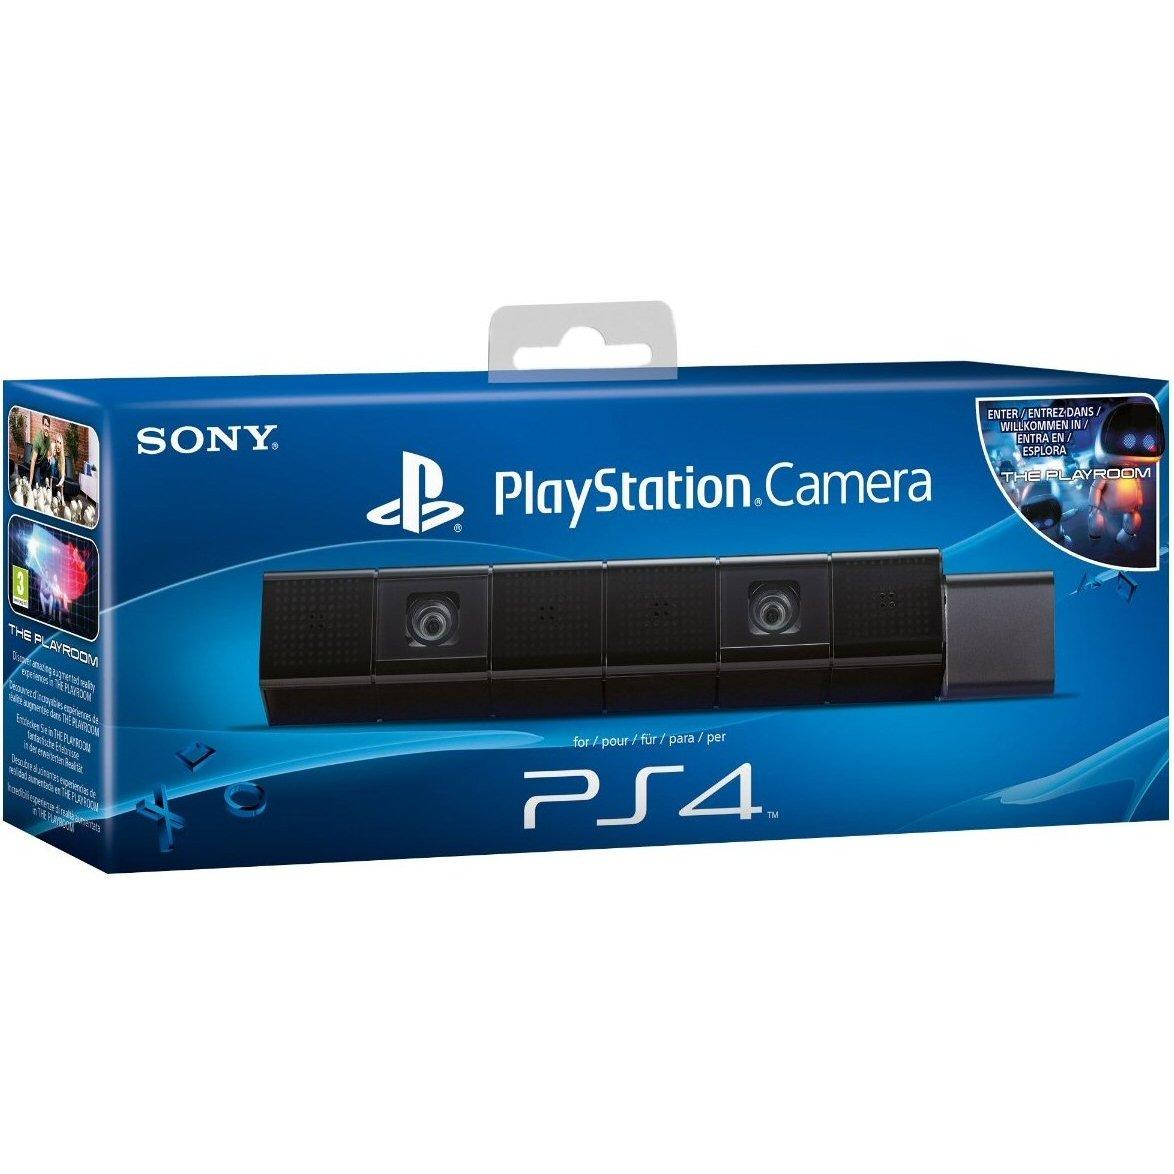 Sony PlayStation 4 Camera (PS4/PSVR): Amazon.co.uk: PC & Video Games